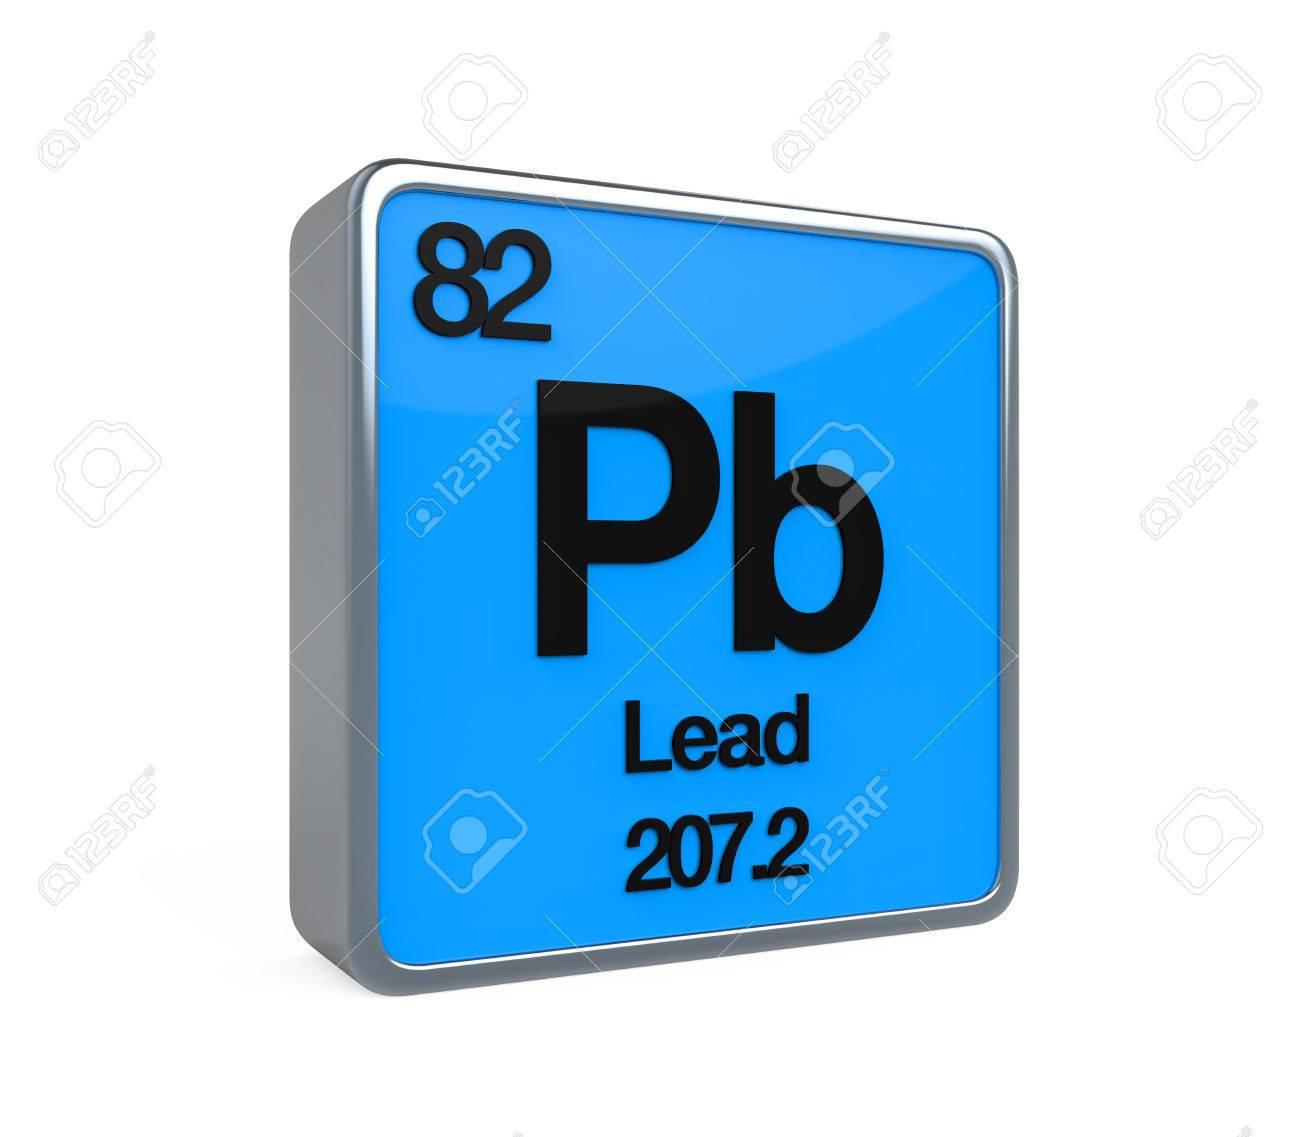 Lead element periodic table stock photo picture and royalty free lead element periodic table stock photo 32898034 urtaz Images